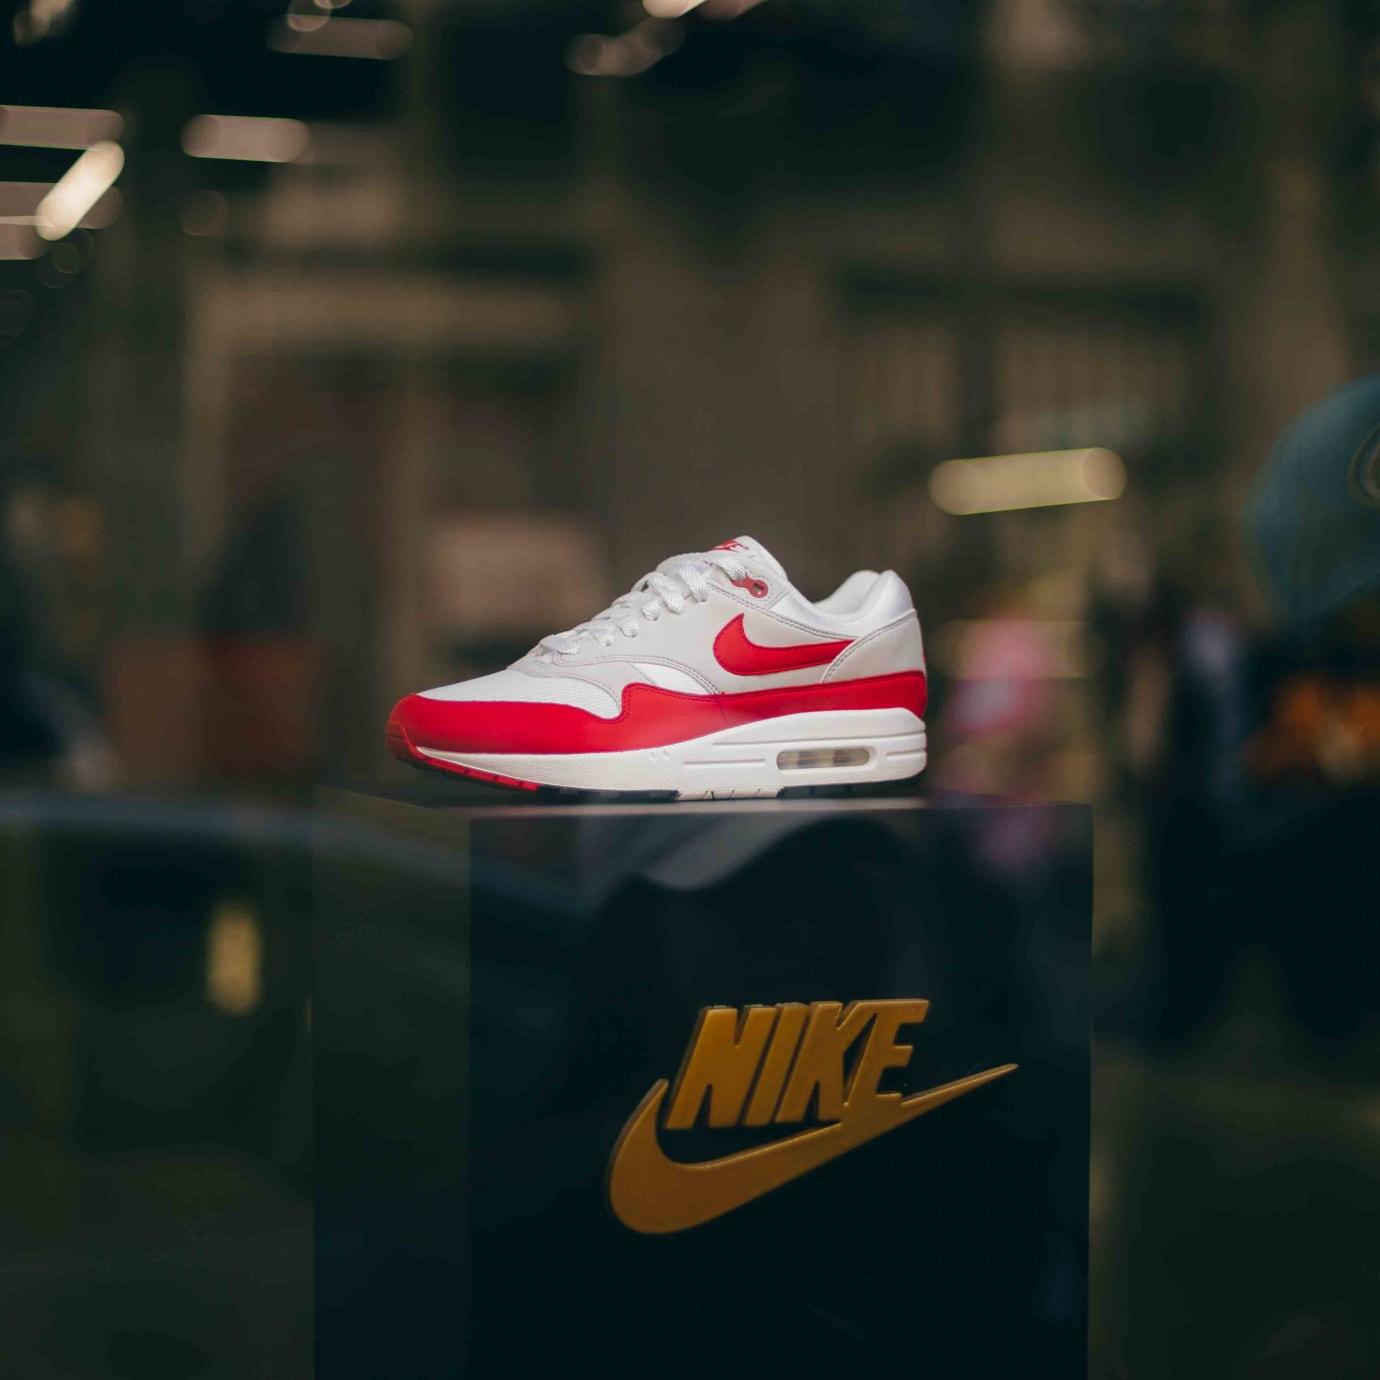 8486e754ef3 Foot District Sneaker Slot Machine | Sole Collector